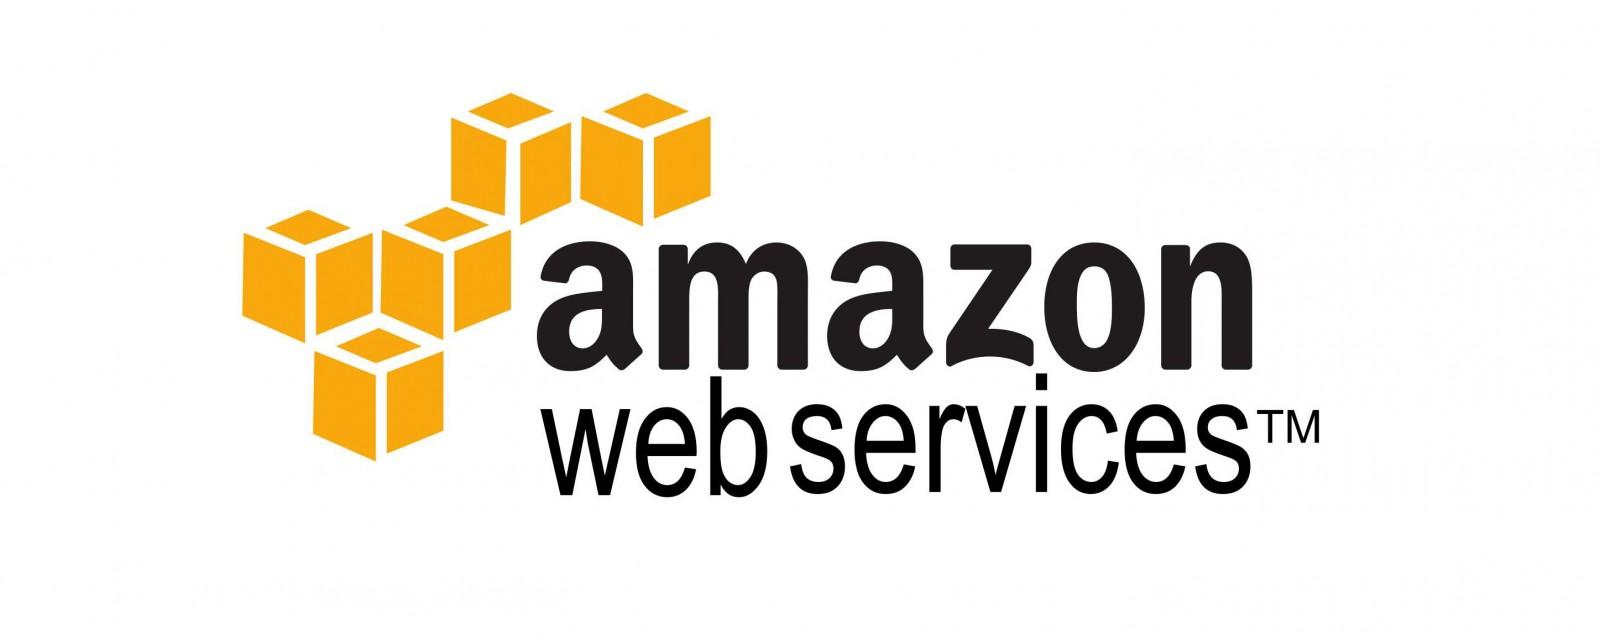 AWS Amazon Web services logo 1